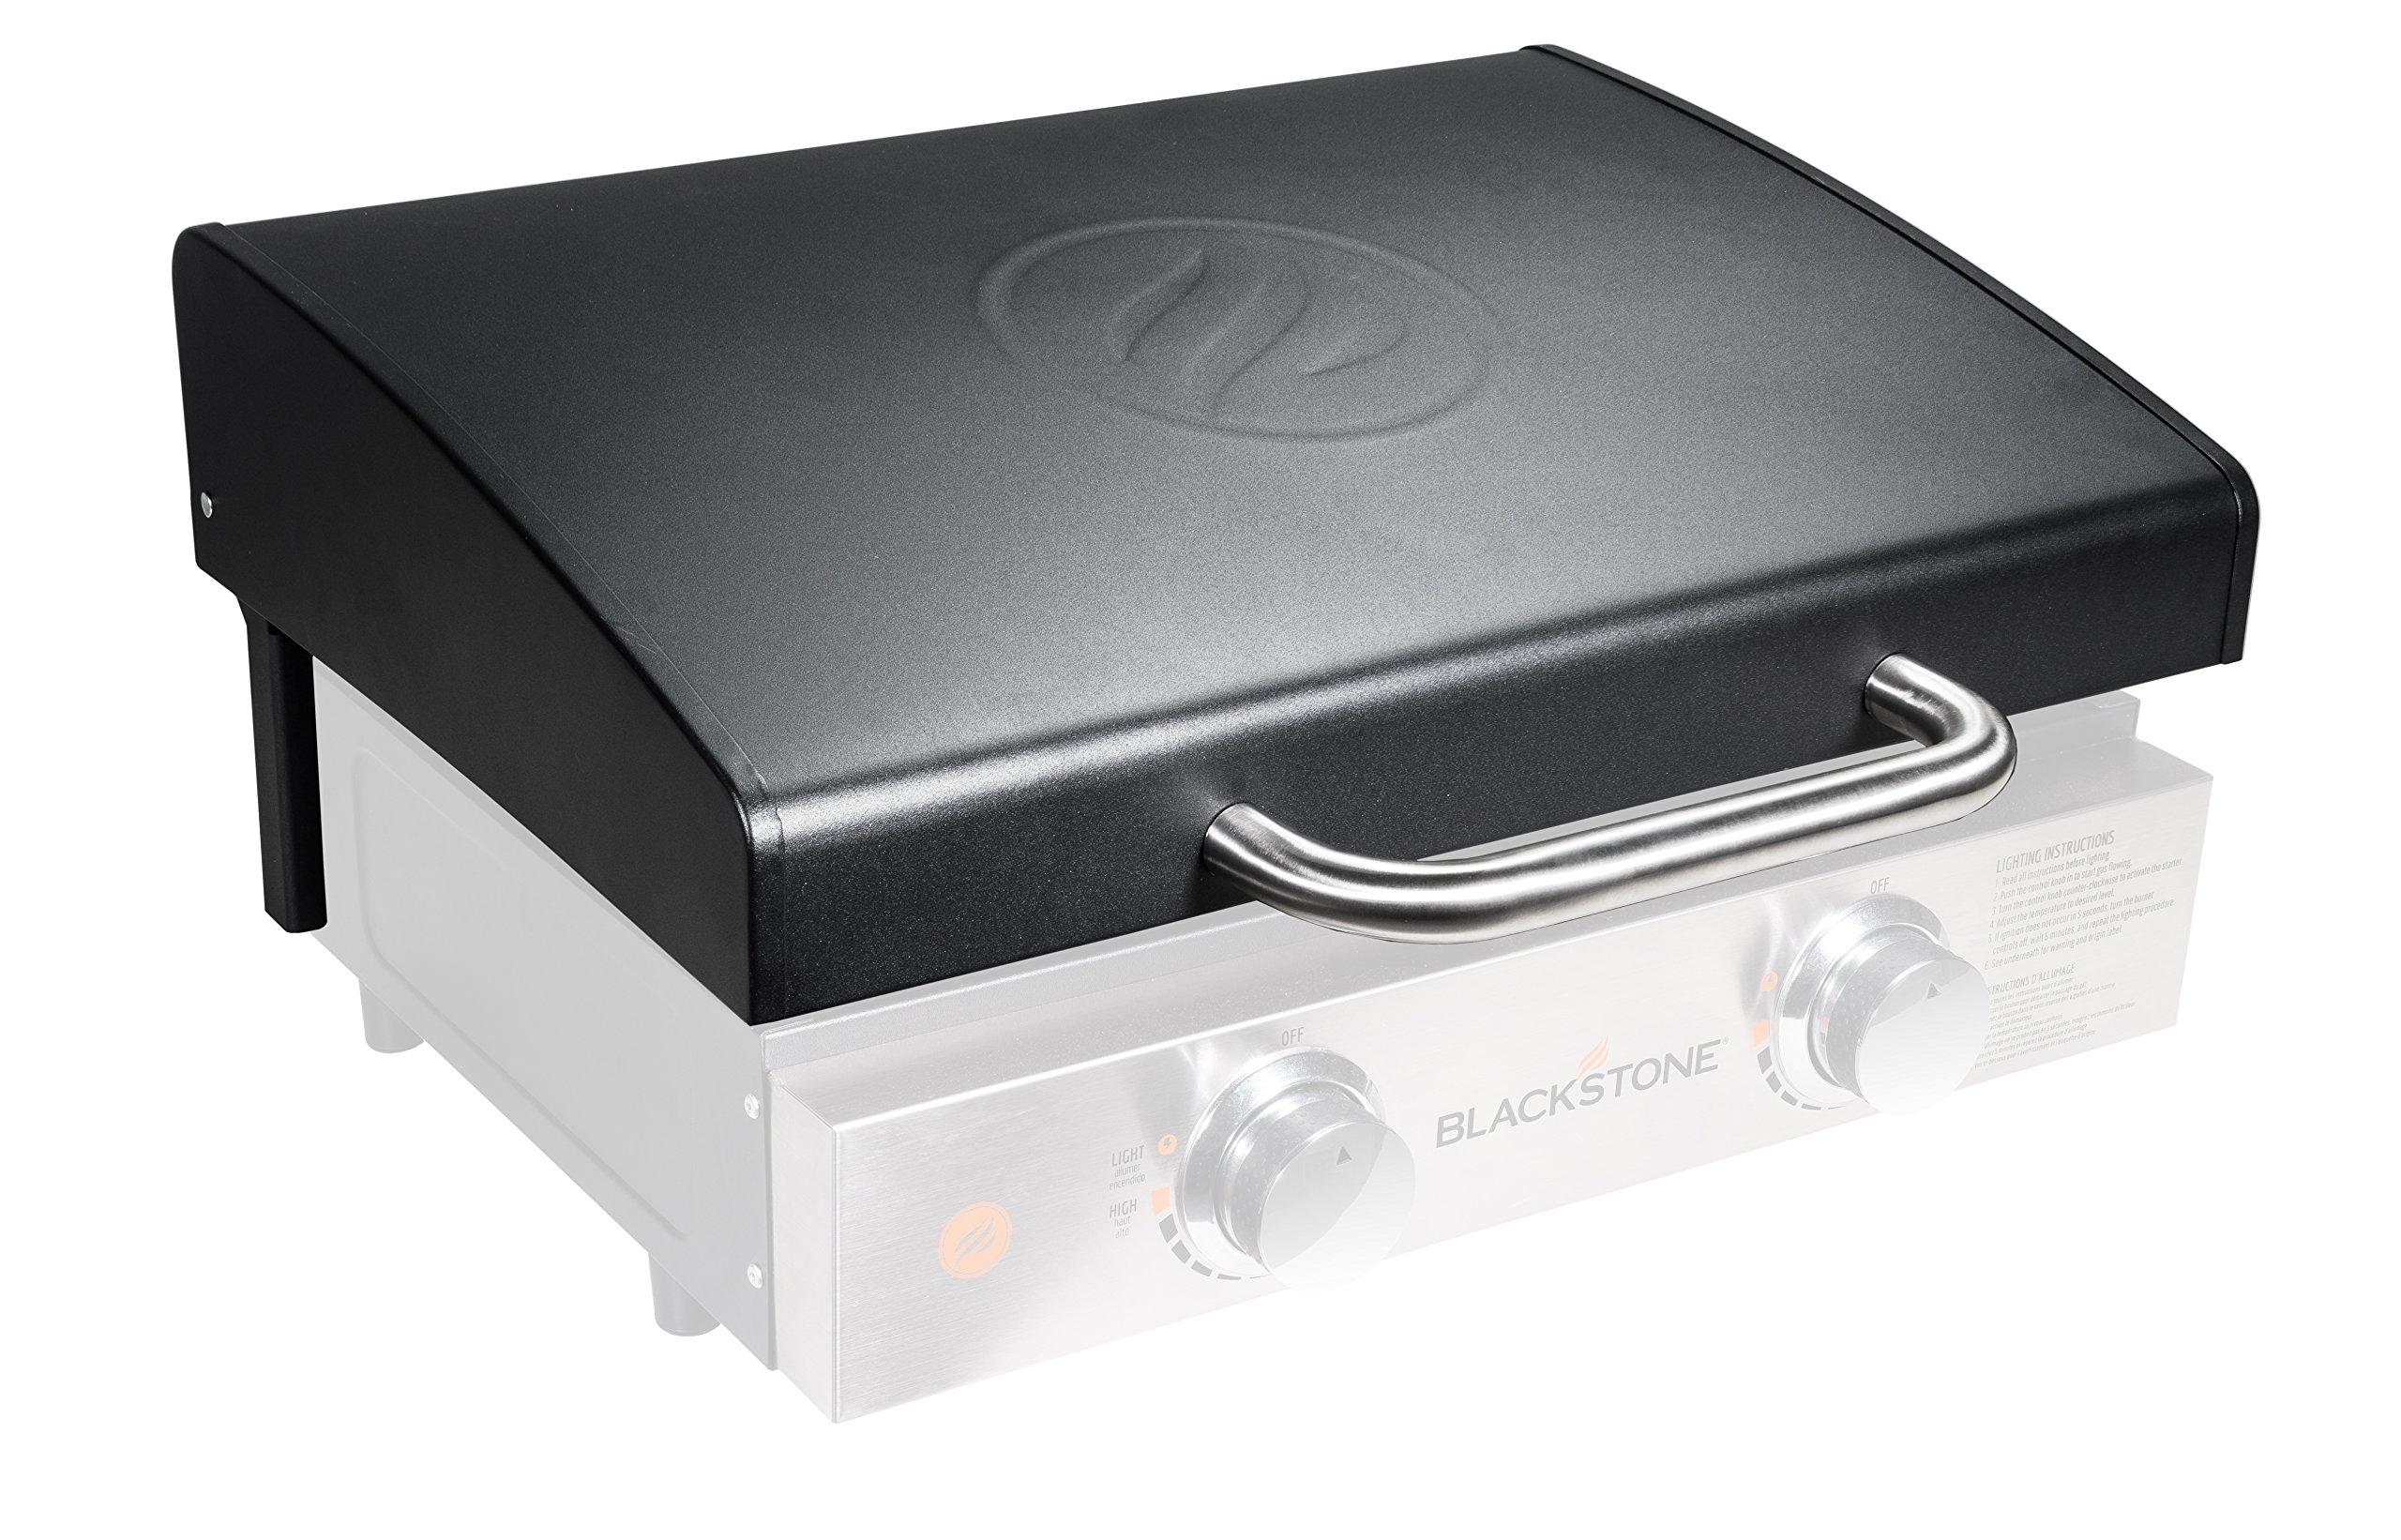 Blackstone 5011 Signature Accessories-22 Griddle Hood, Black by Blackstone